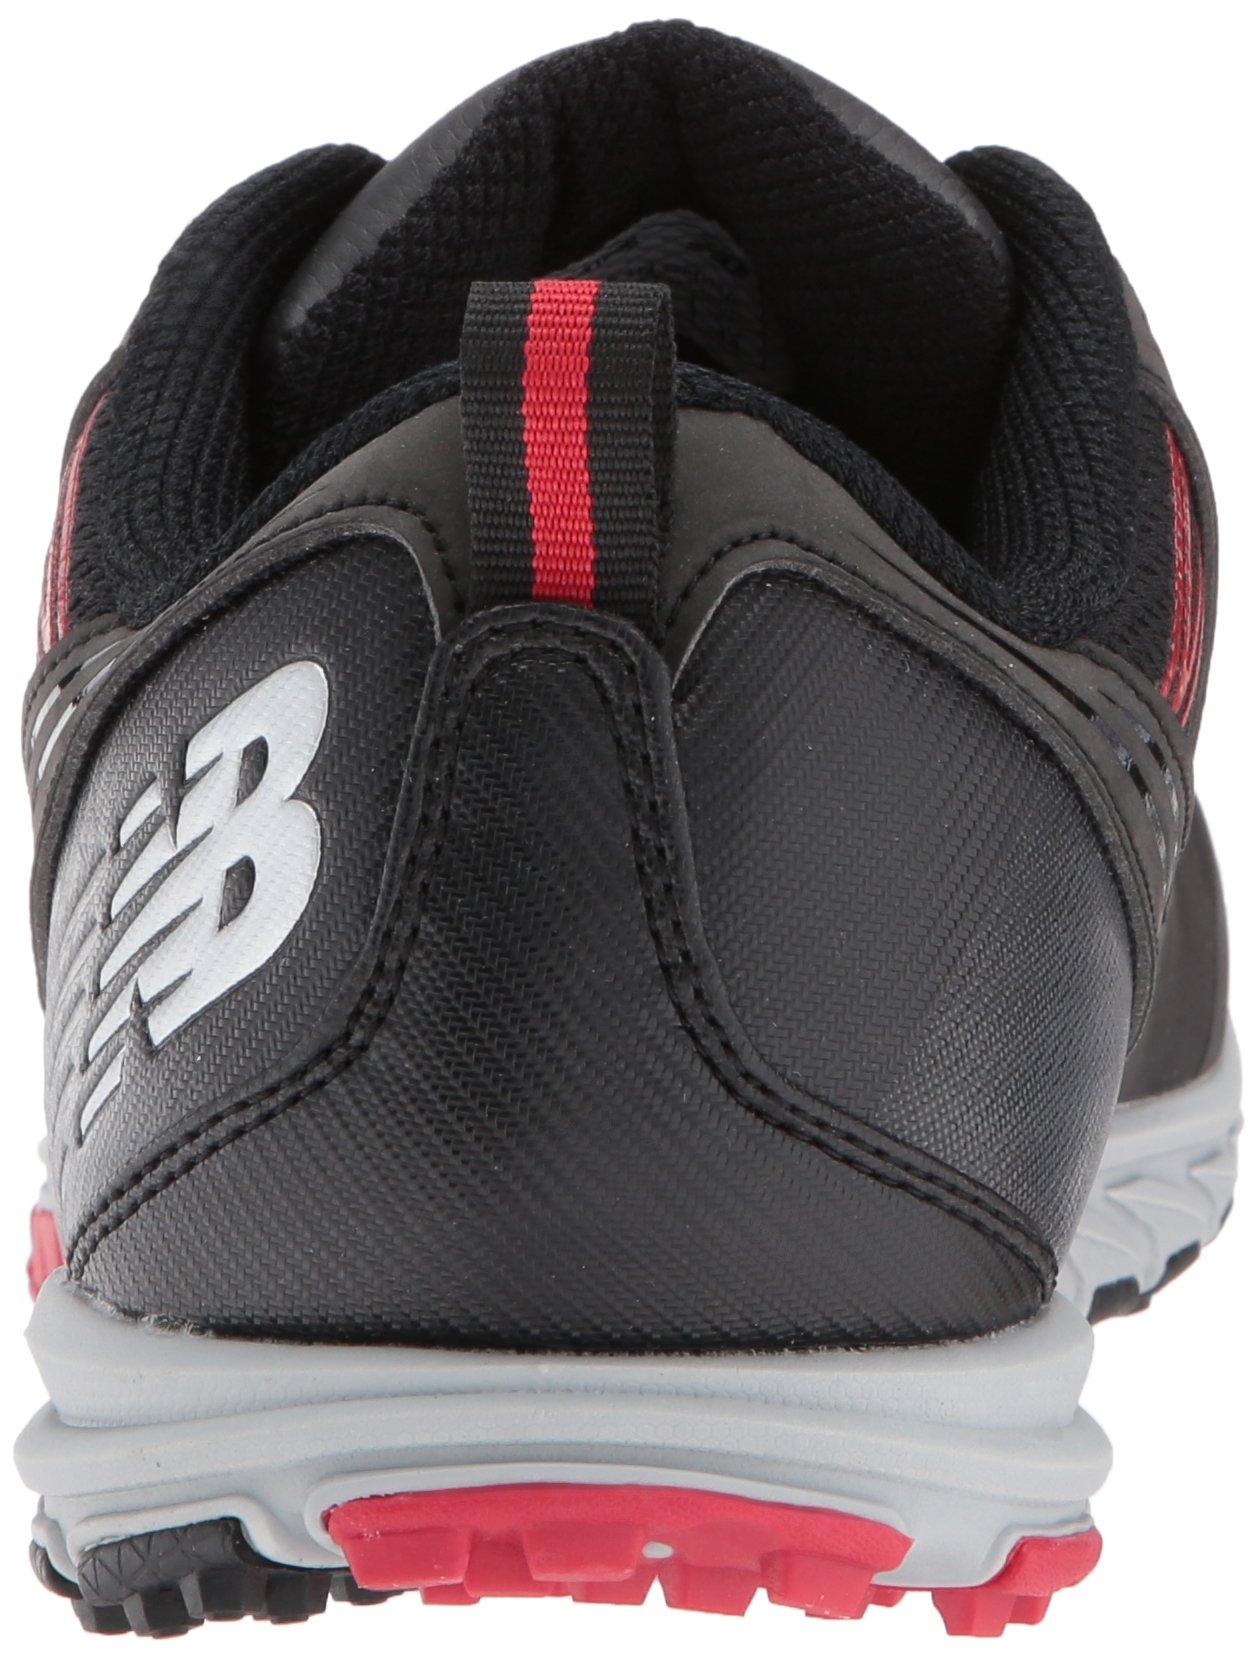 16fd567cbcee5 New Balance Men's Minimus SL Waterproof Spikeless Comfort Golf Shoe by New  Balance (Image #